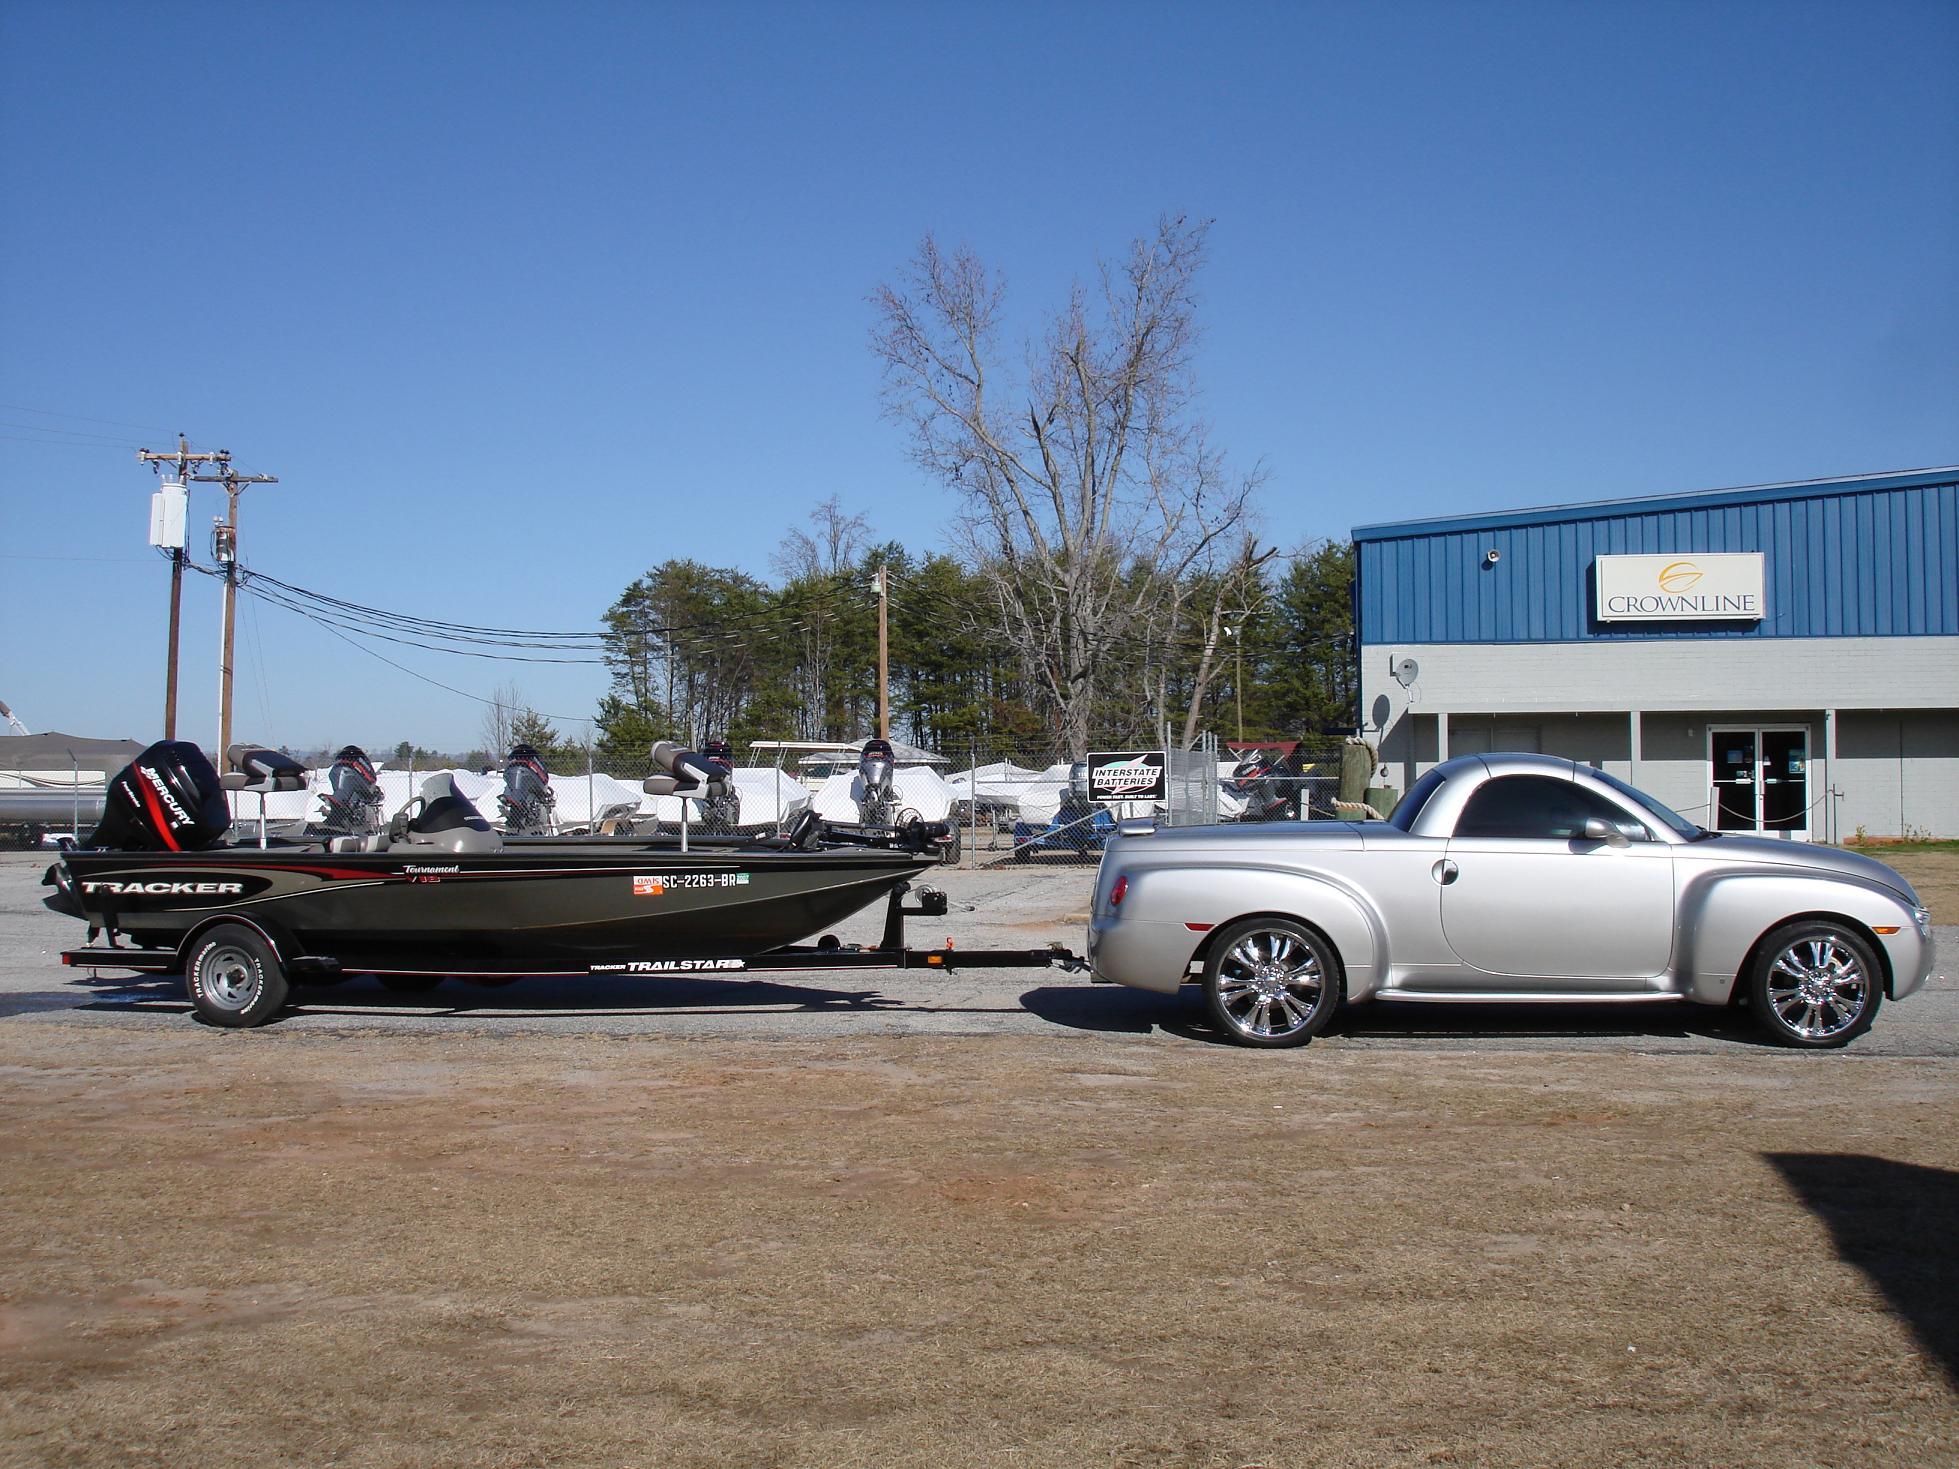 San Bernardino Chevy Dealer >> The SSR...Wow, What a Cool Tow Vehicle! - Chevy SSR Forum